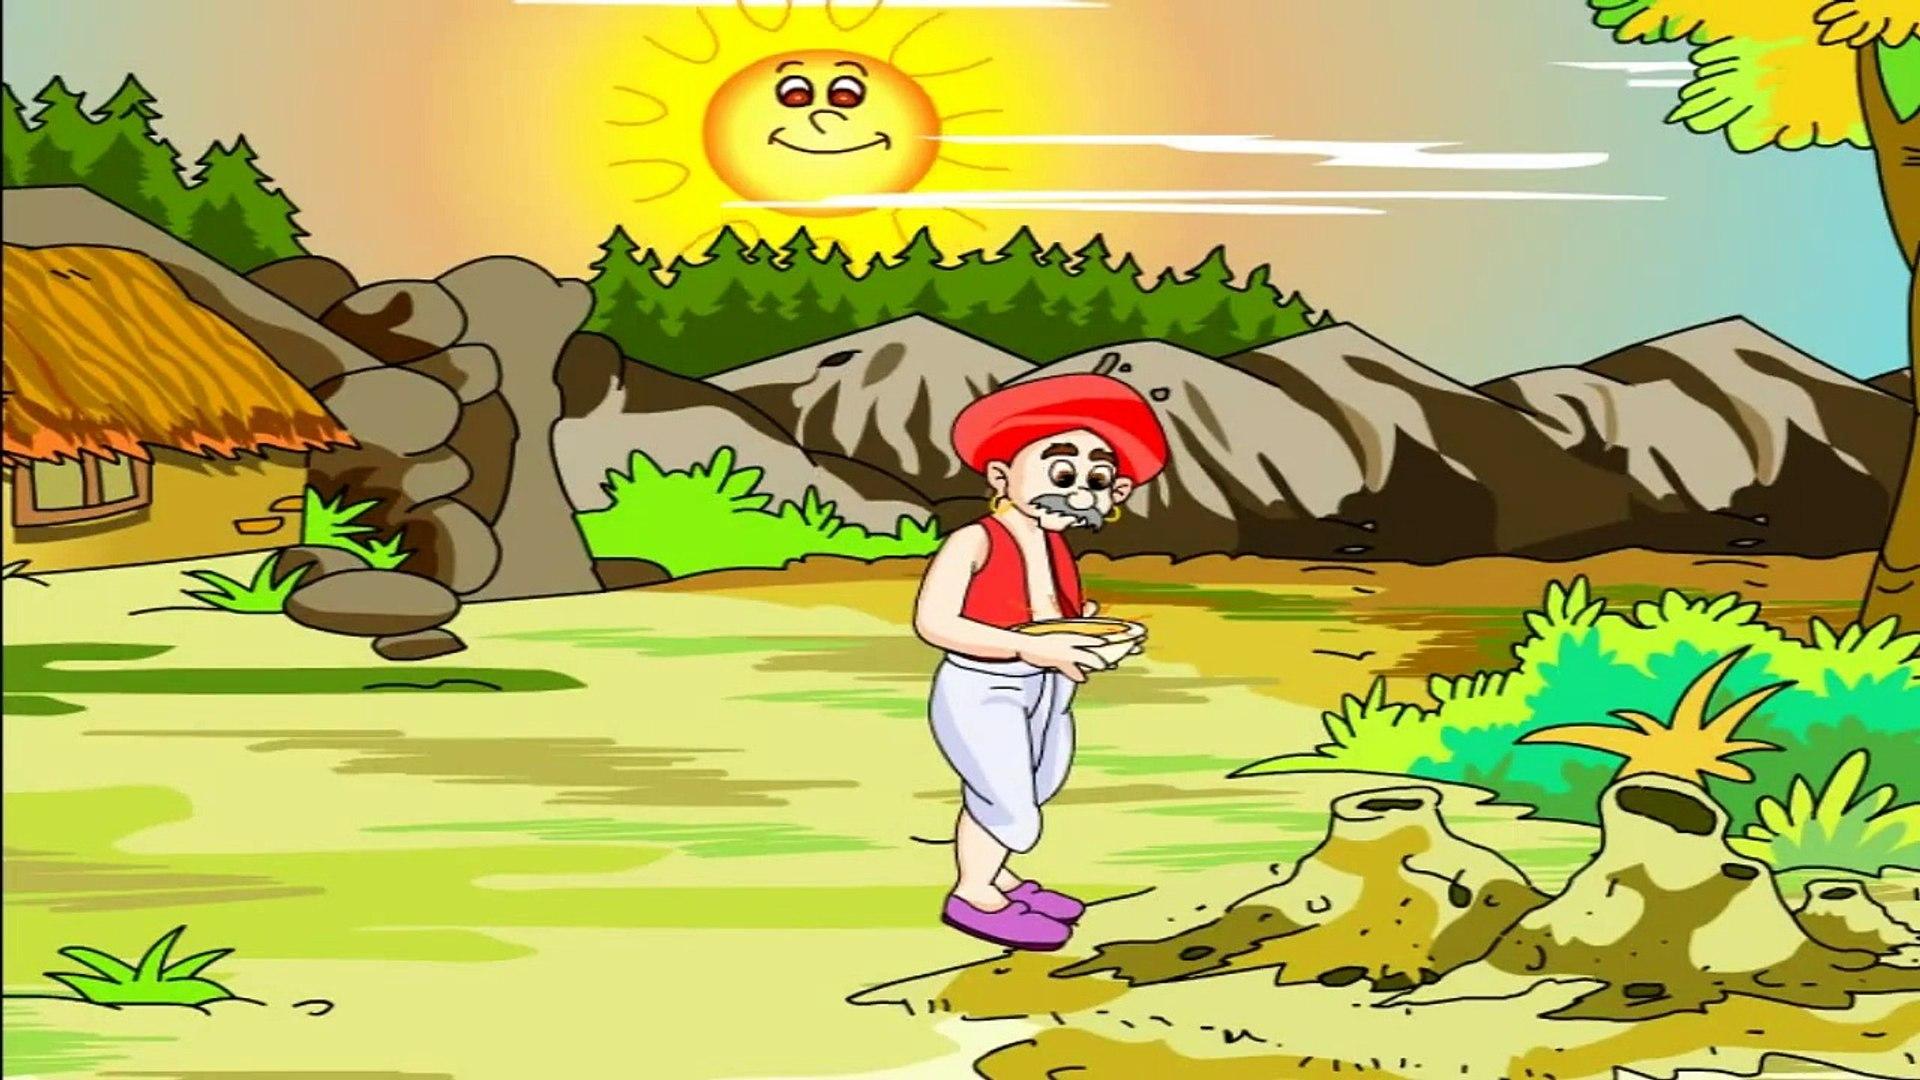 किसान और साँप ## Famous Moral Story - Hindi Videos For Kids Education